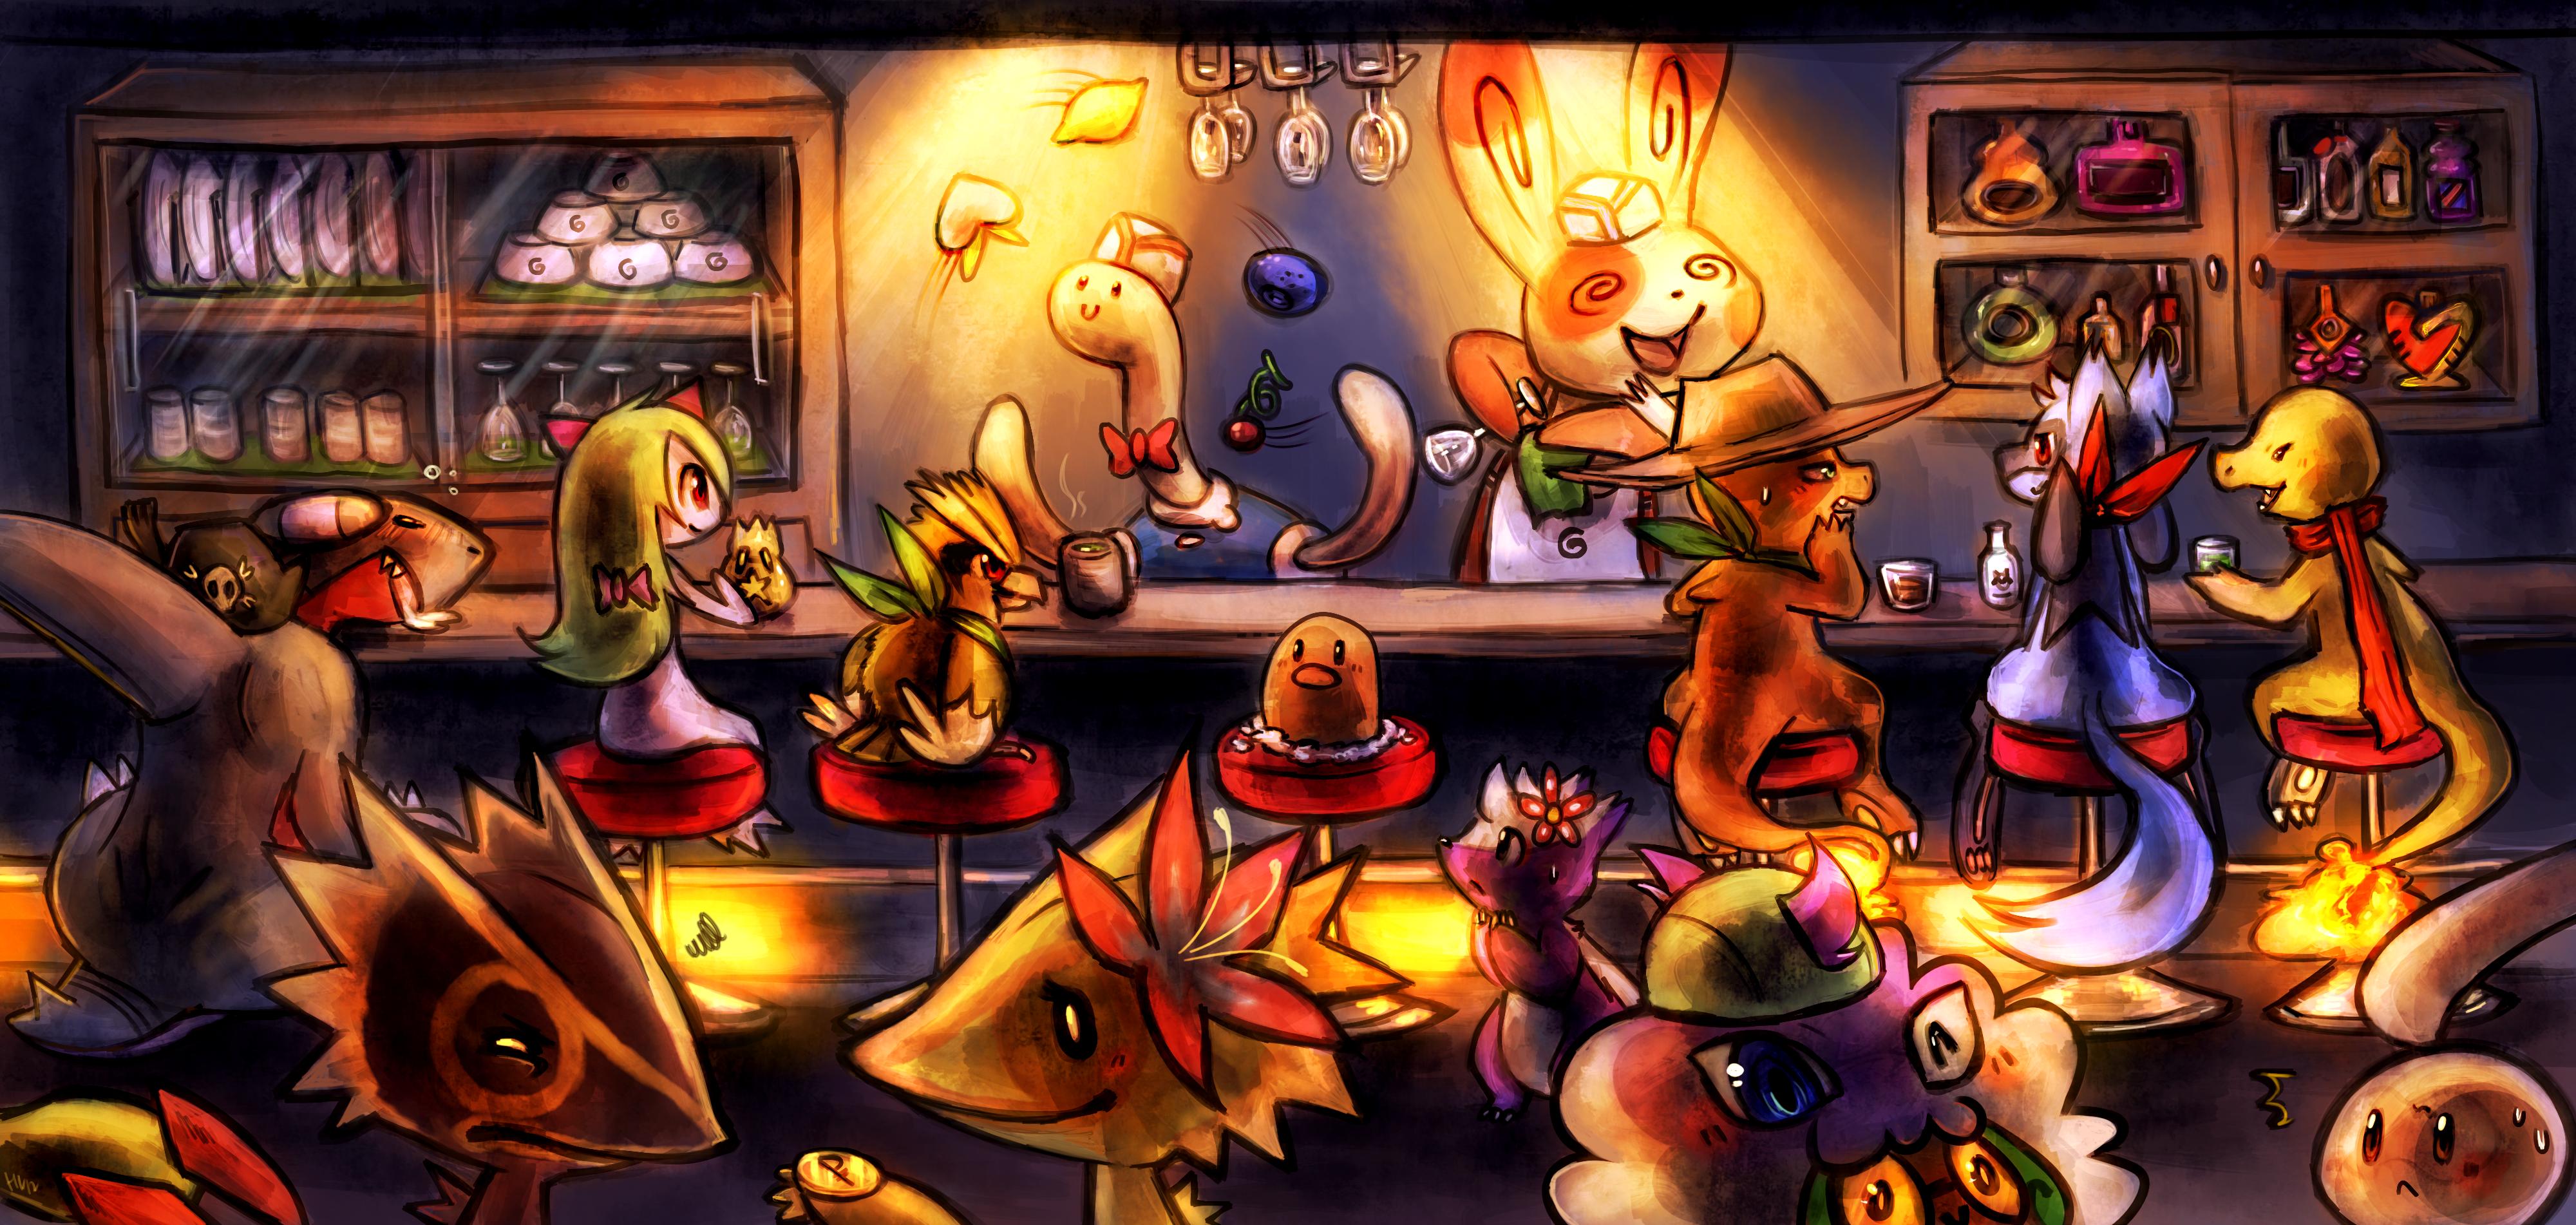 Spinda Cafe by Haychel